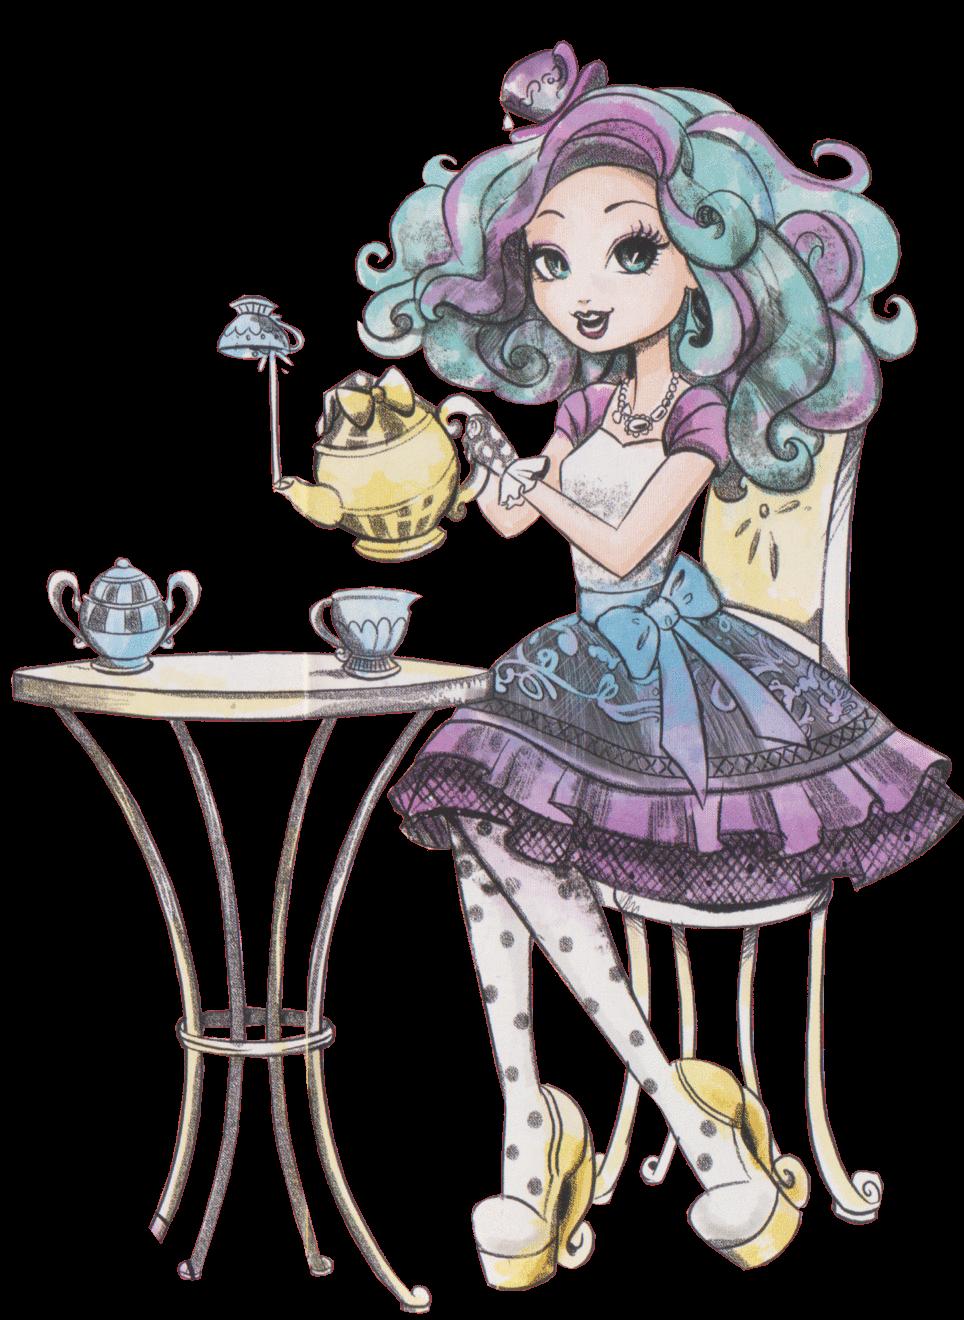 madeline hatter royal rebel pedia wiki fandom powered by wikia